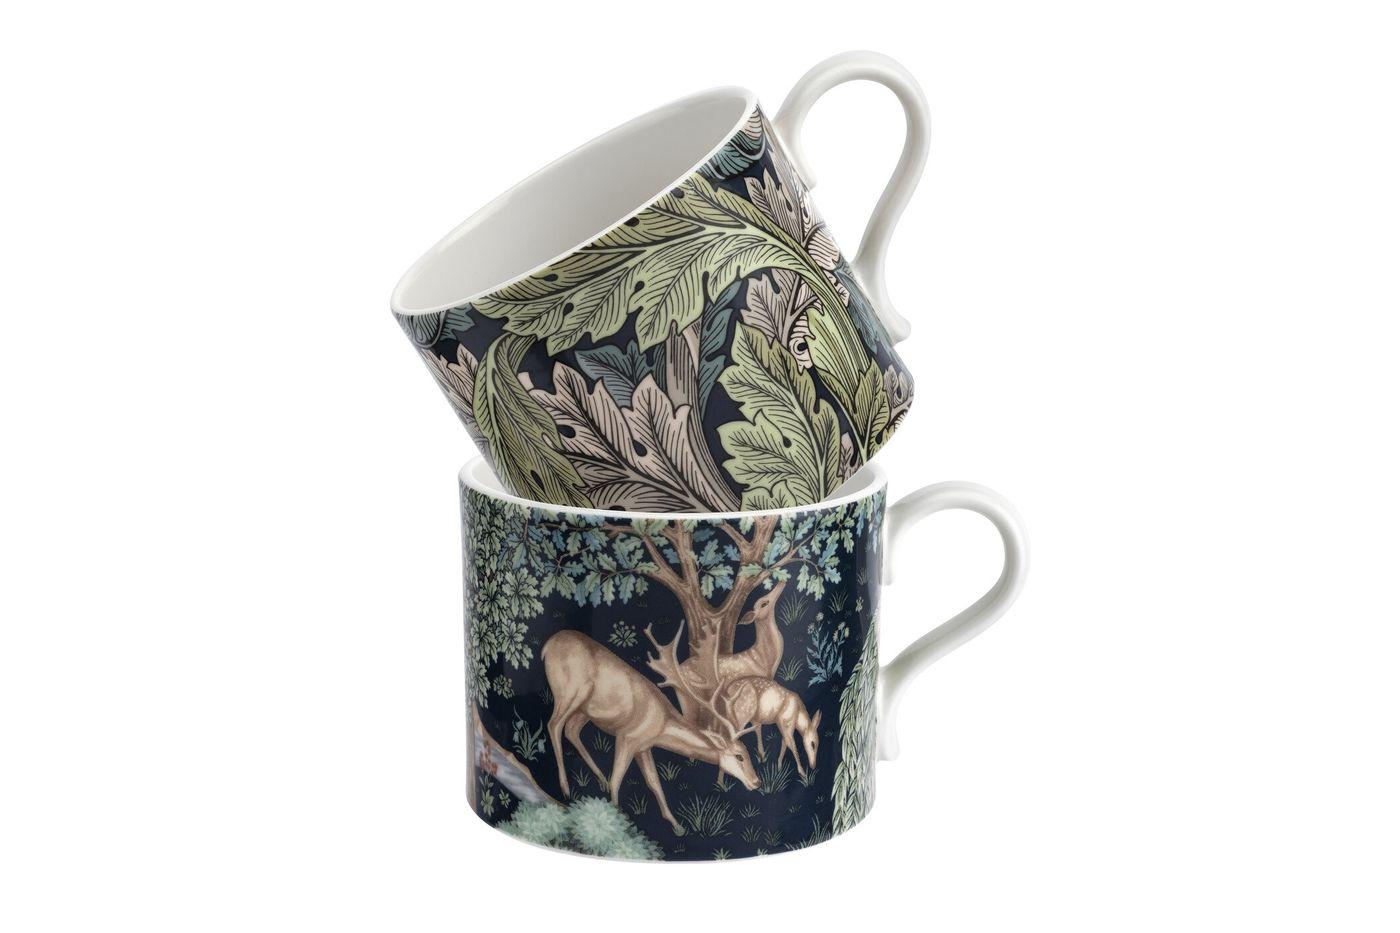 Spode The Original Morris & Co. Mug - Set of 2 Brook & Acanthus 0.34l thumb 2